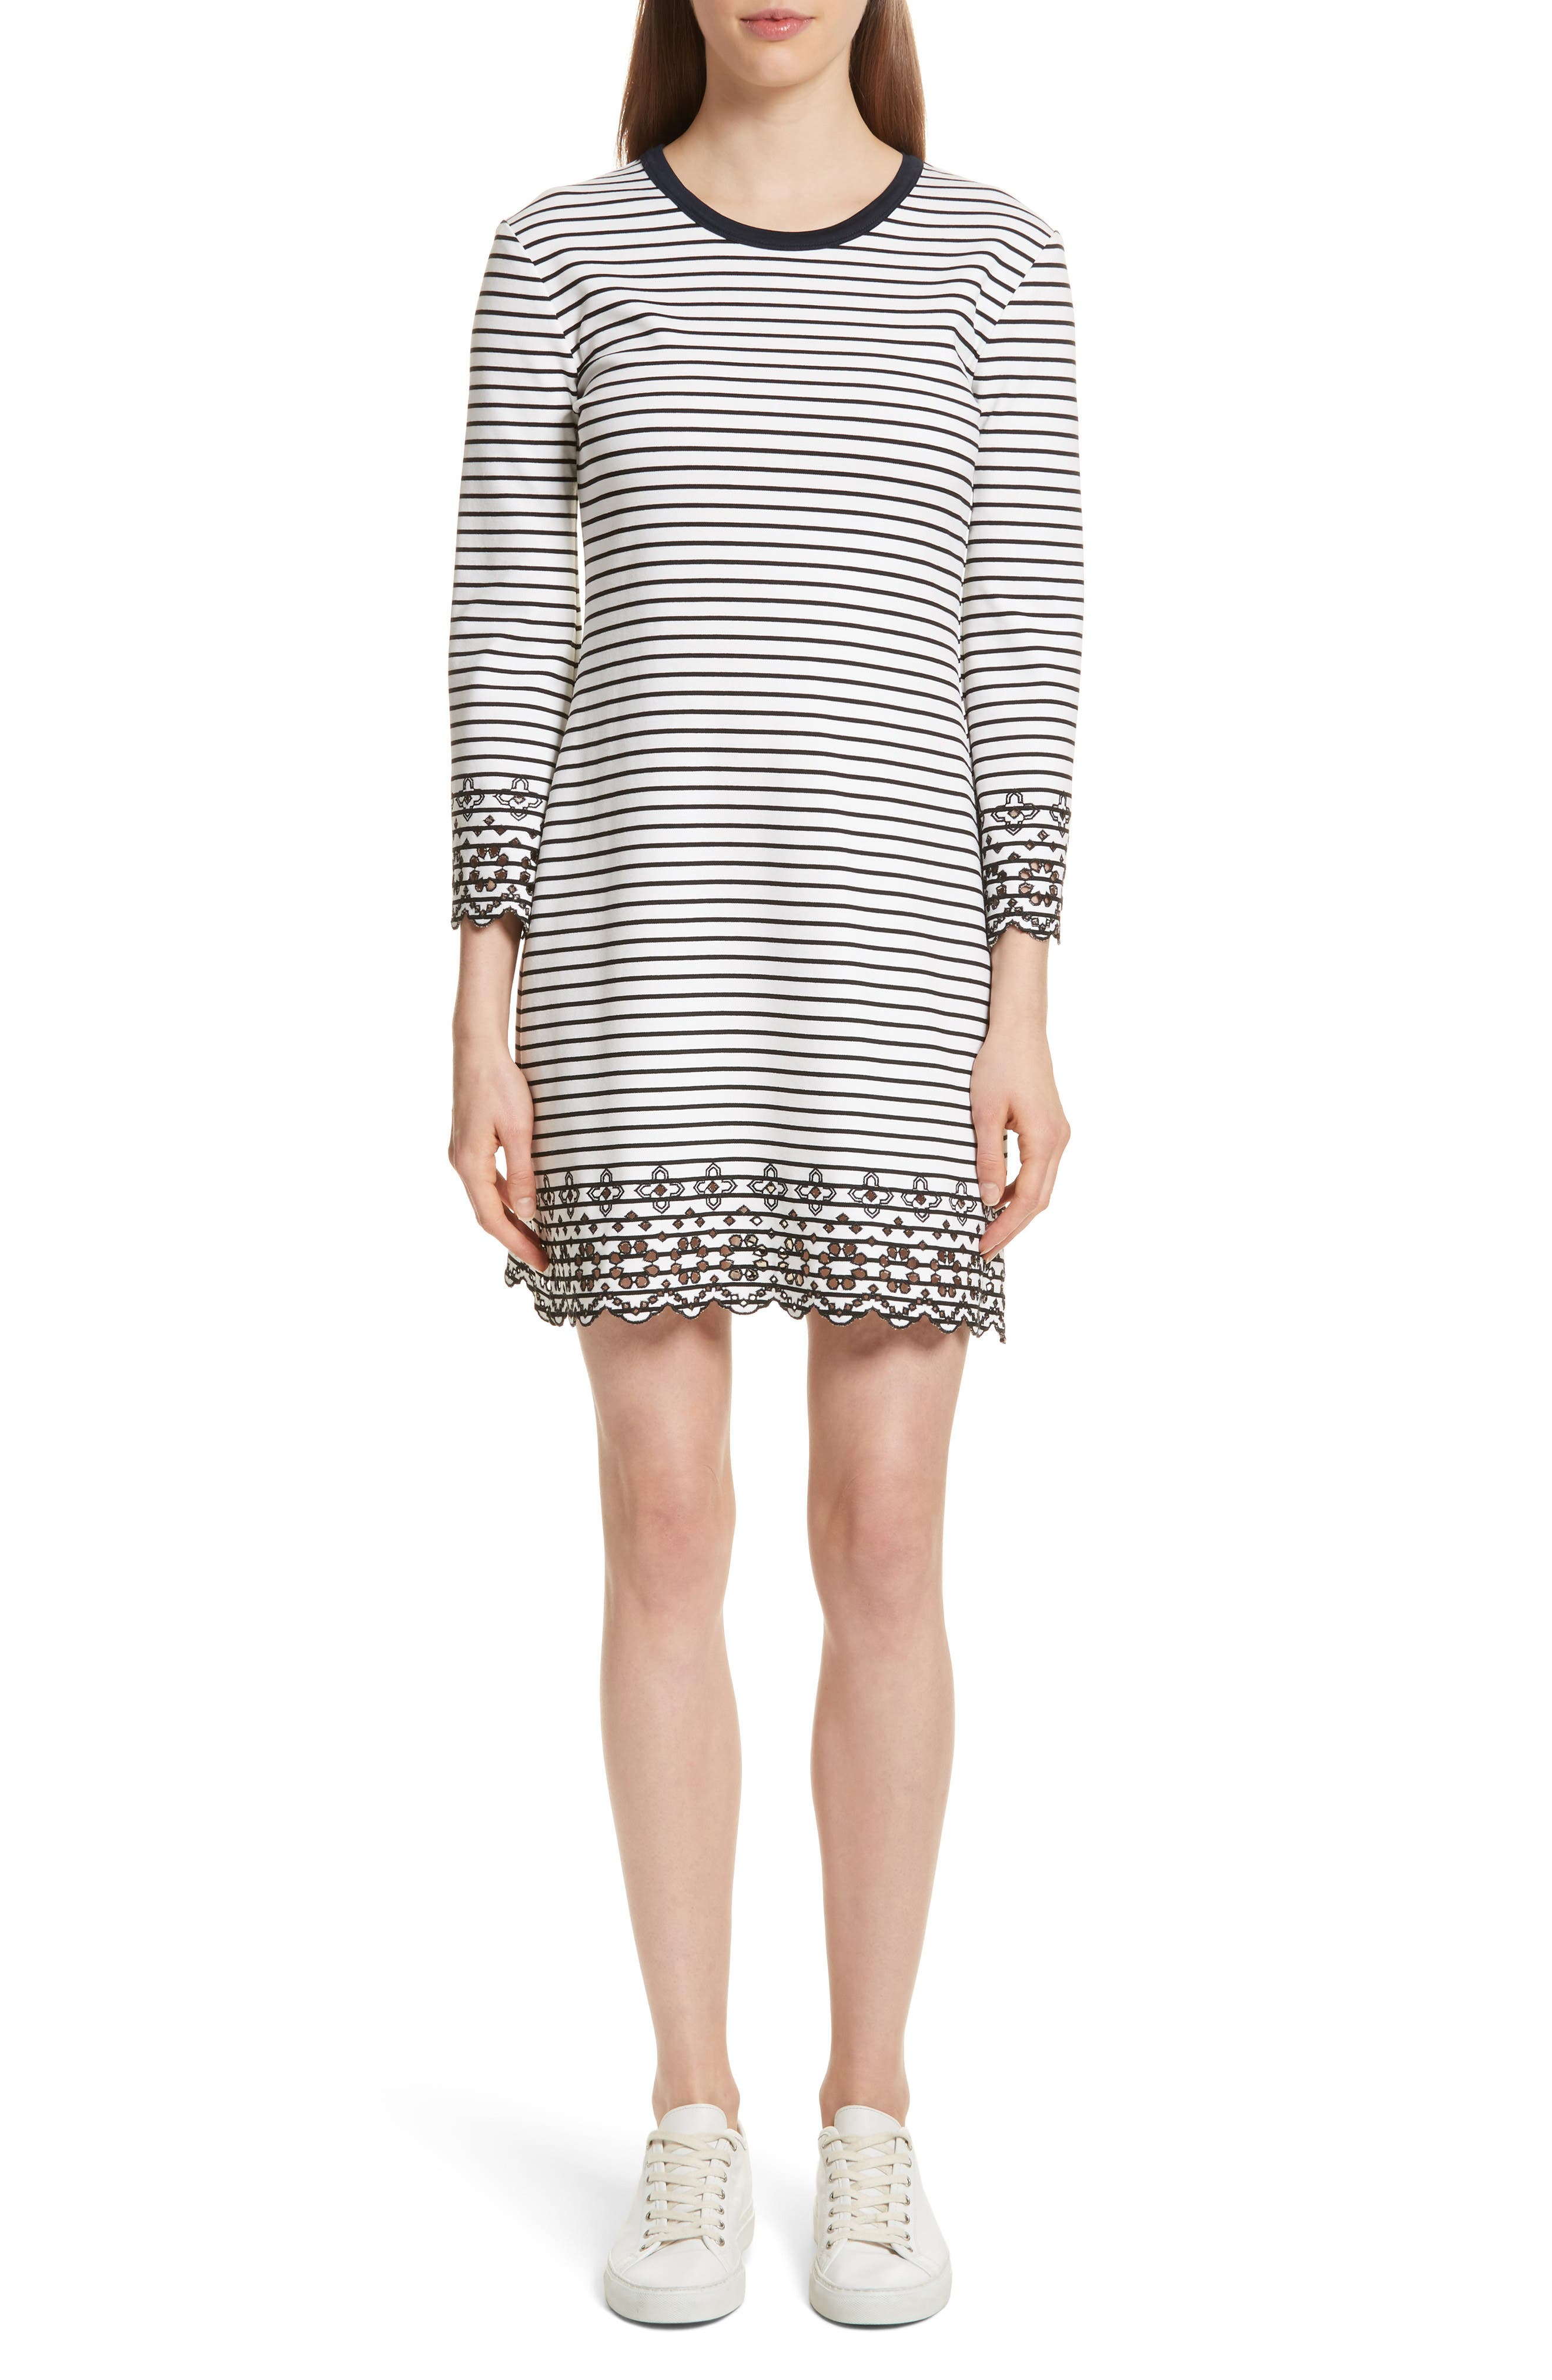 Derek Lam 10 Crosby Embroidered Stripe Knit Dress